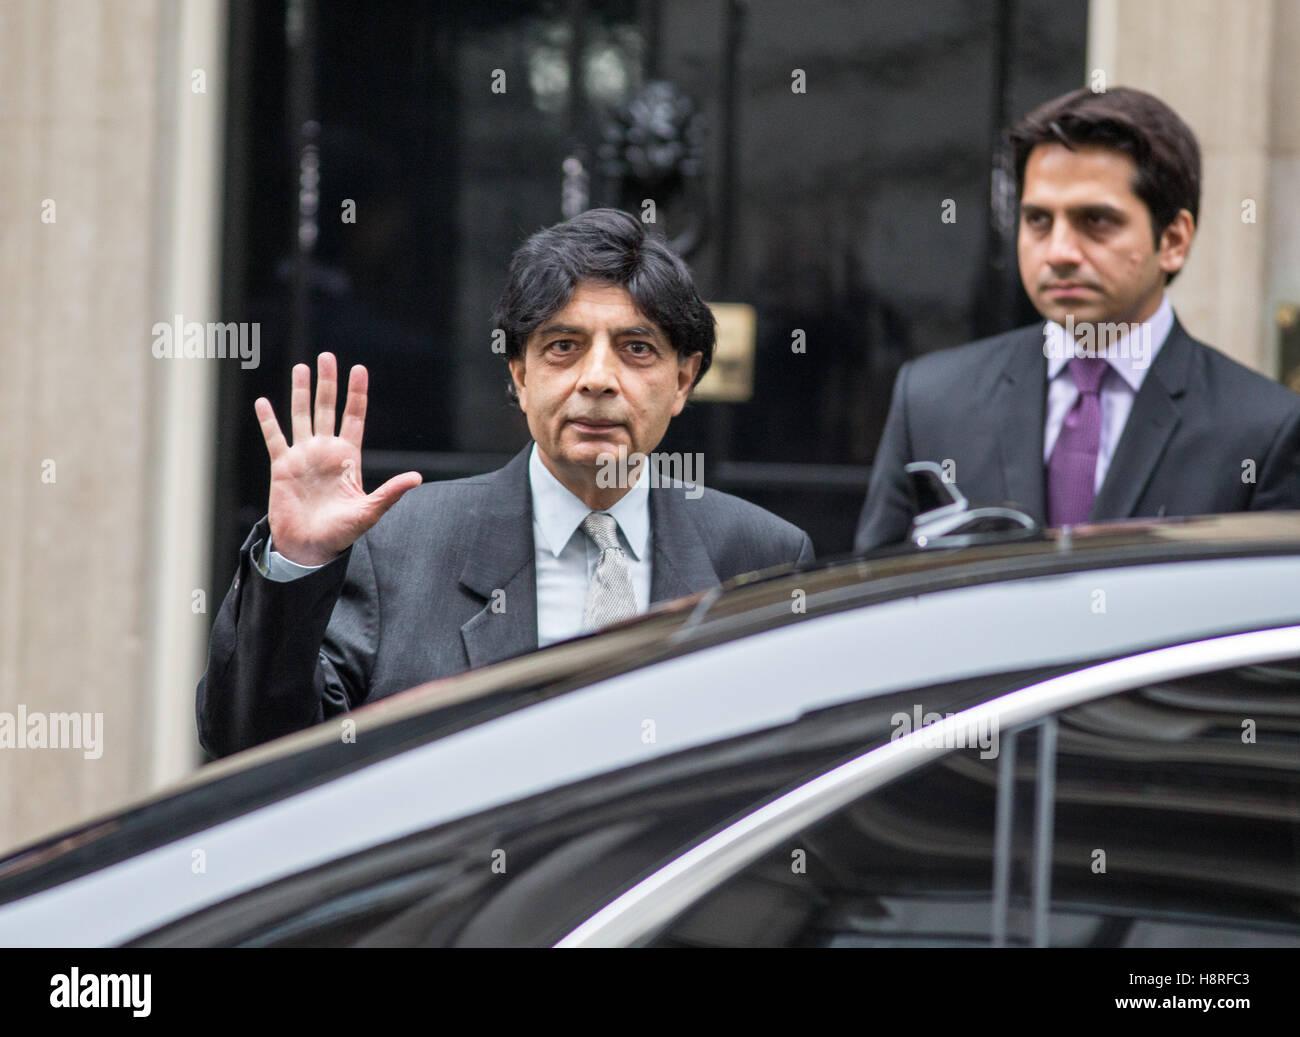 Chaudhry Nisar Ali Khan, pakistanischer Politiker und Minister des Innern und Narcotics Control Iat 10 Downing Street. Stockbild